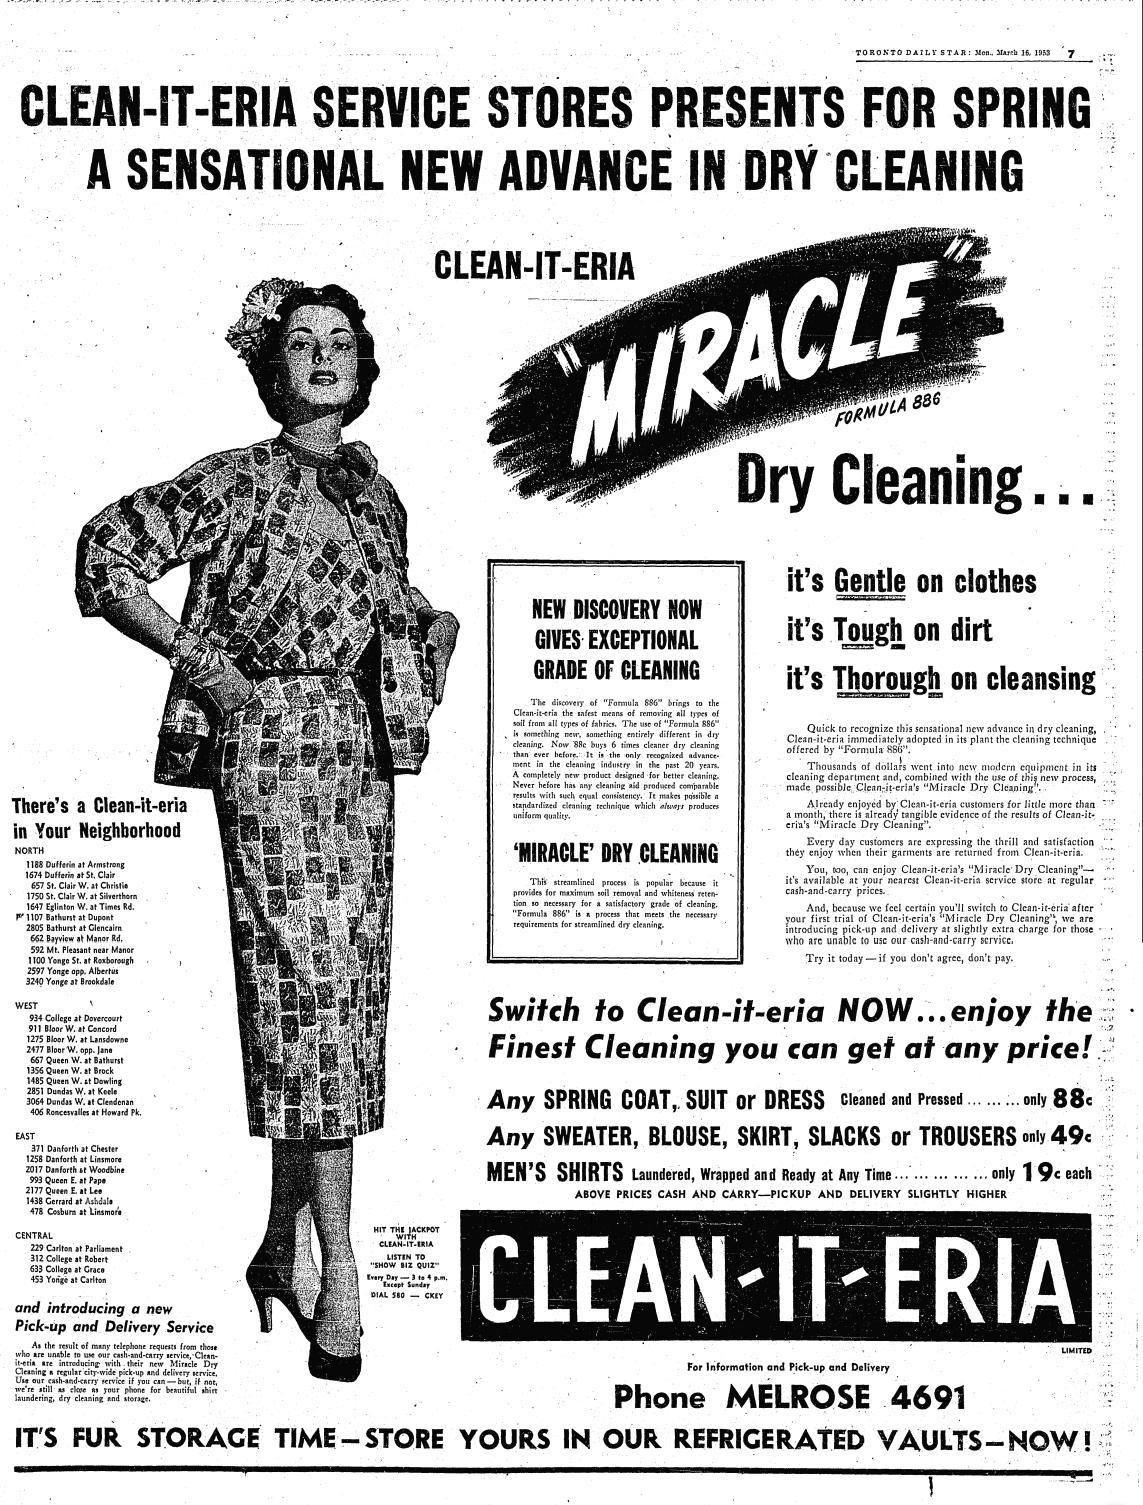 clean-it-eria-ash-toronto-star-march-16-1953